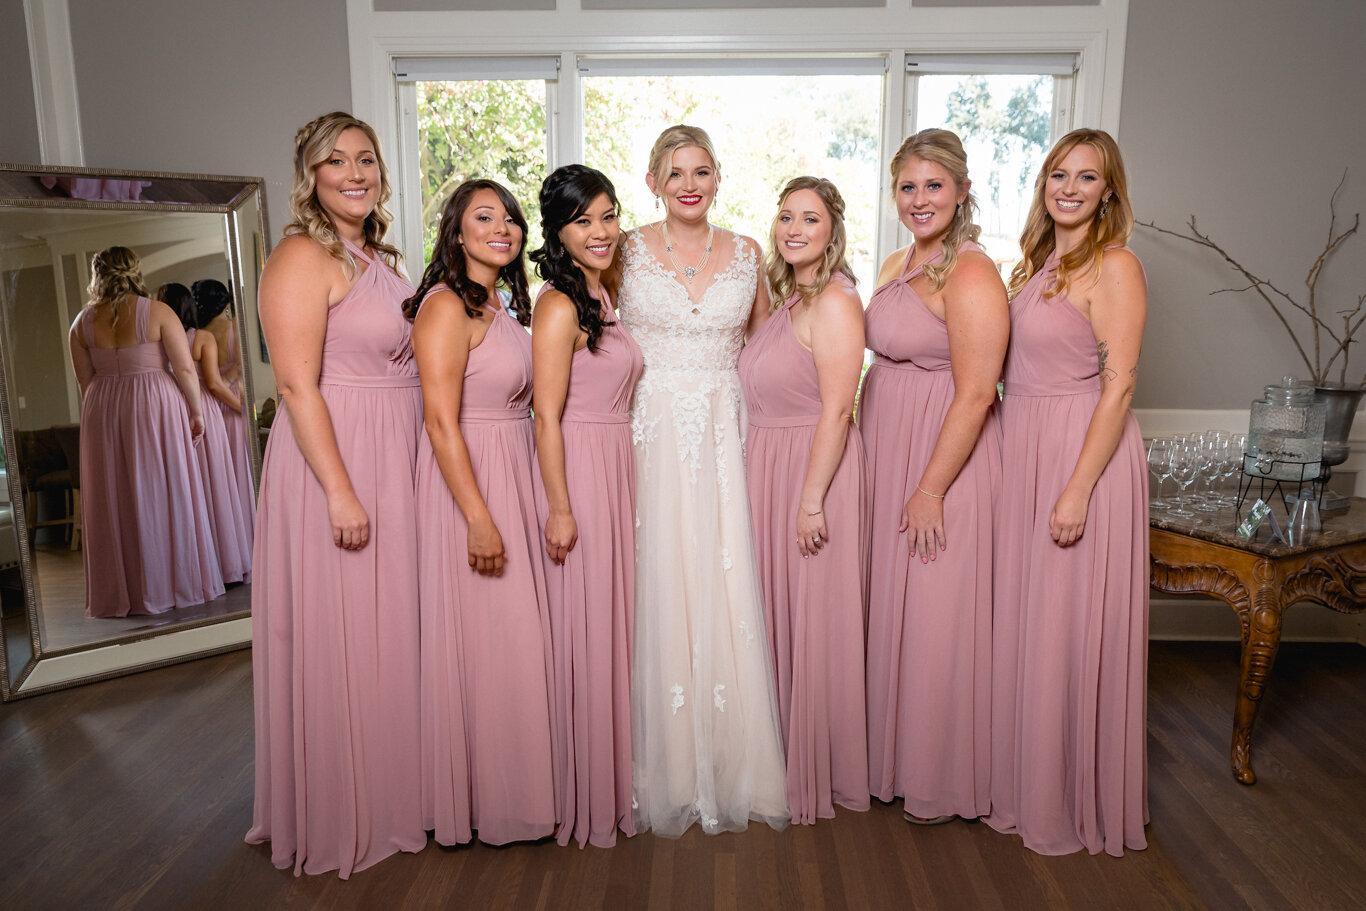 2019.08.24_Emily-Ashir-Wedding-at-the-Maples-5196.jpg